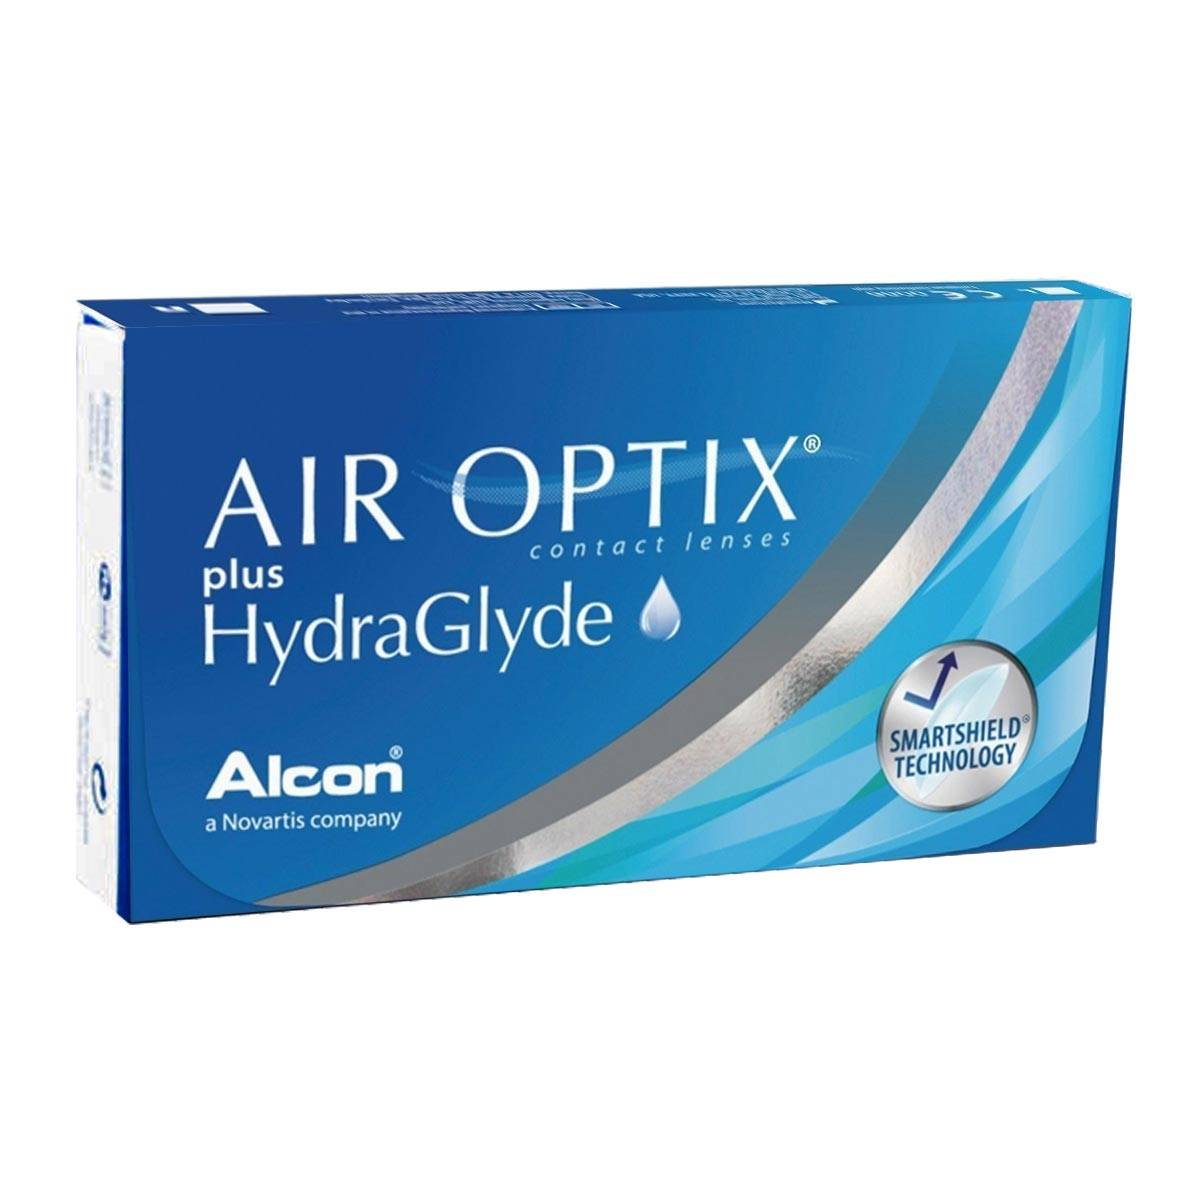 Alcon Air Optix plus HydraGlyde -12.0